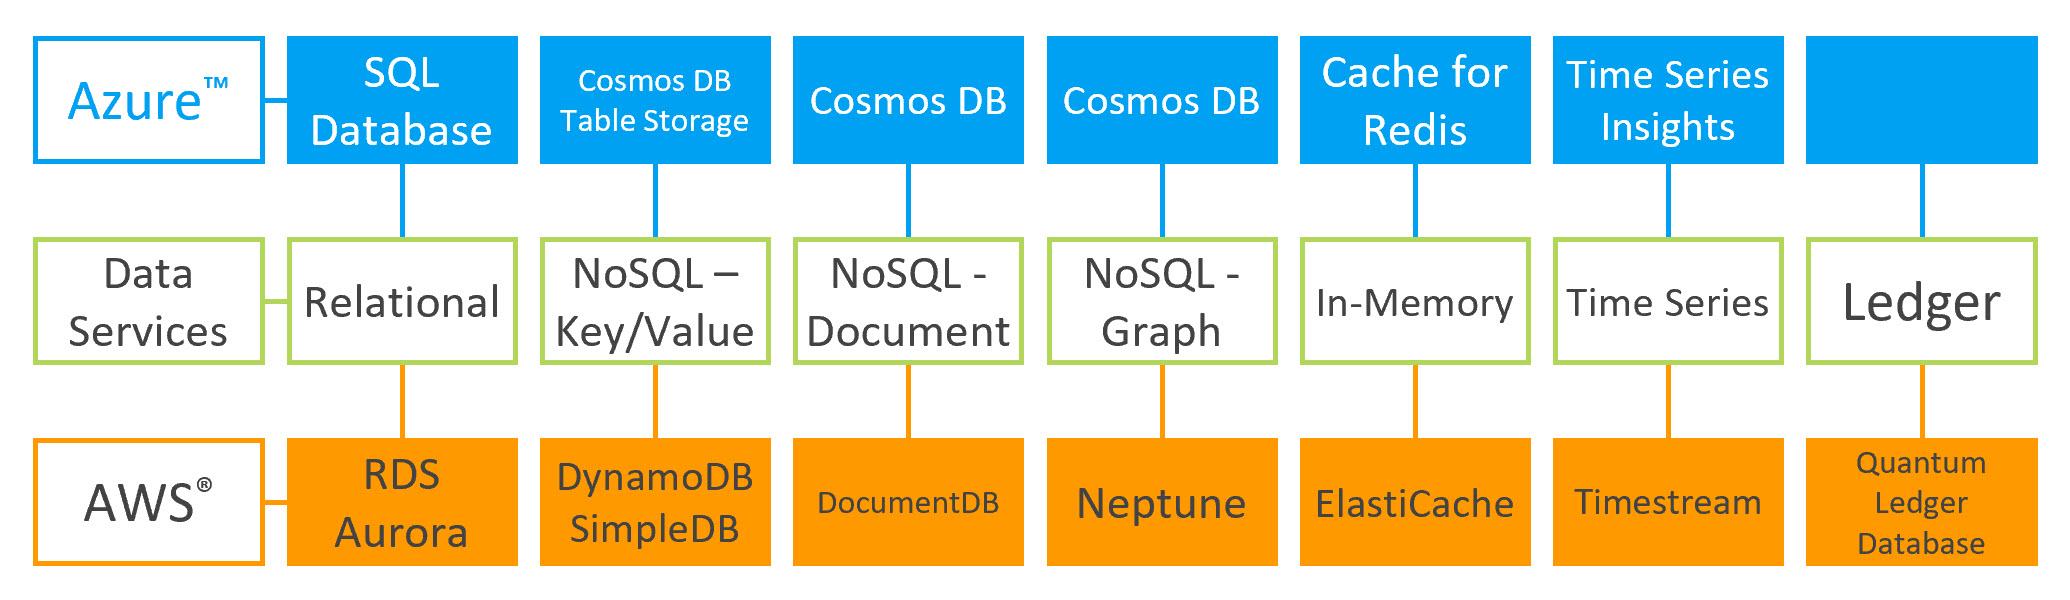 Updated Data Services Comparison: AWS vs  Azure - Thomas LaRock